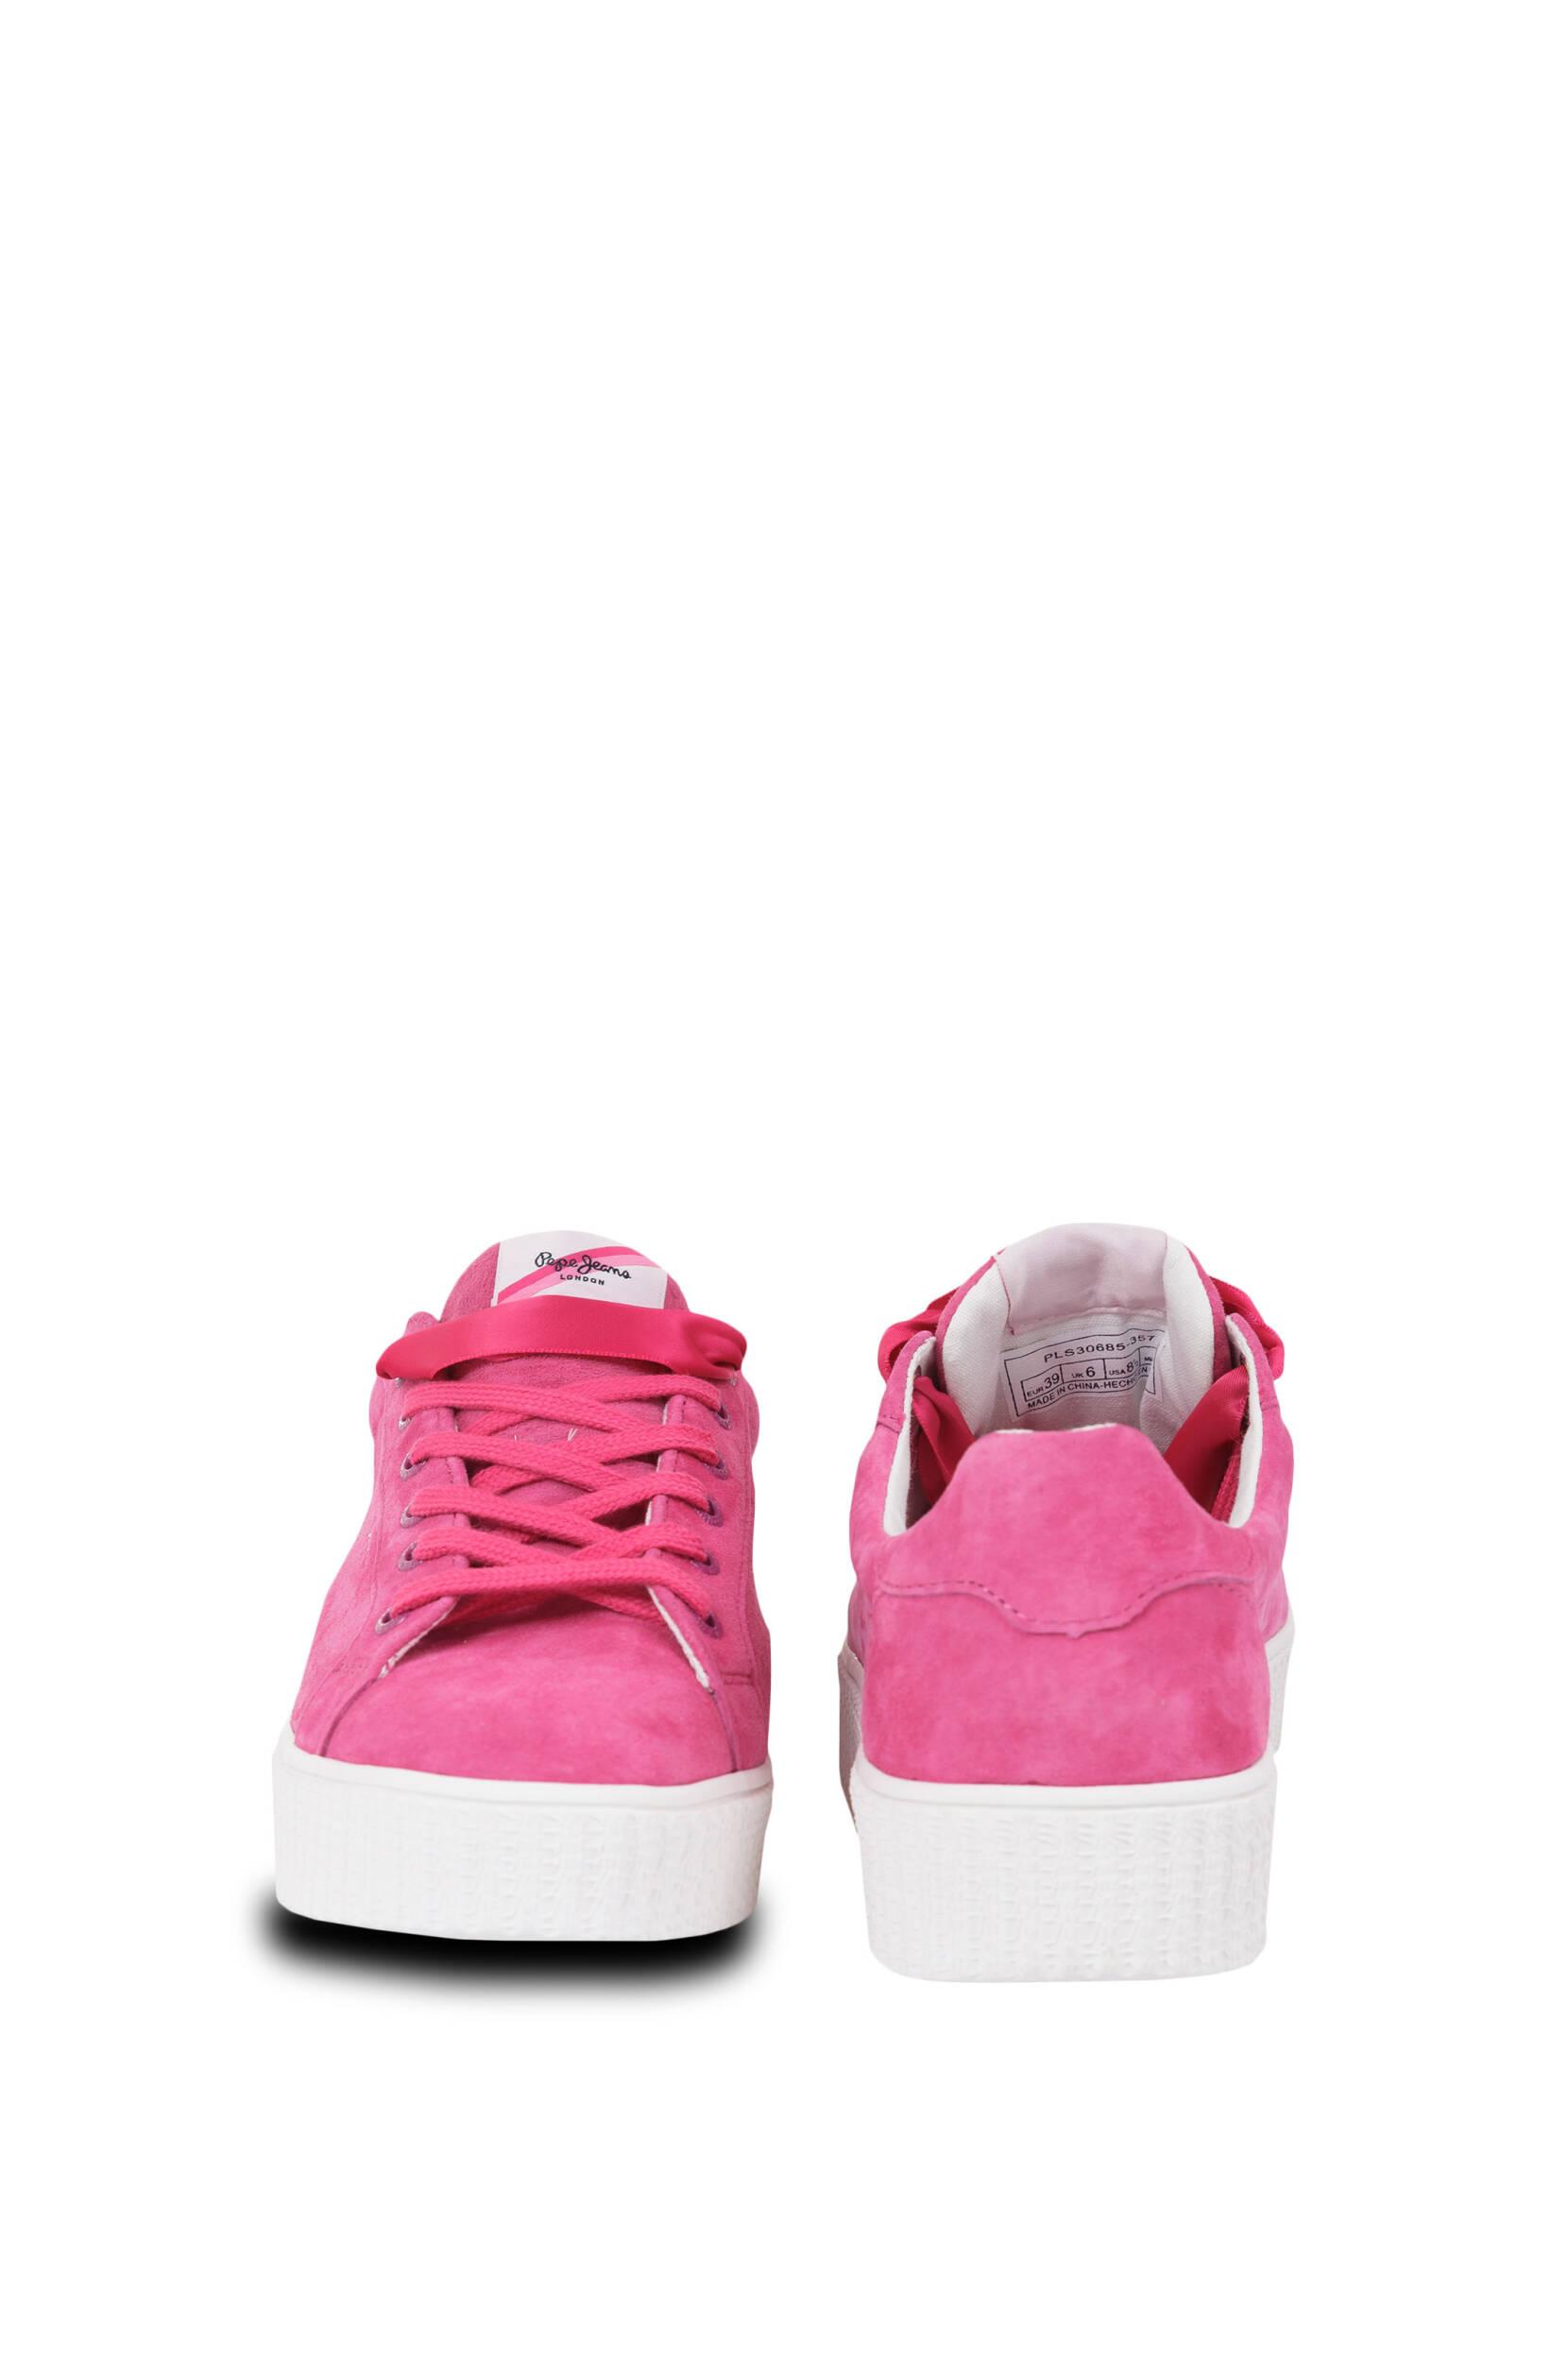 Pepe Jeans Sneaker Frida Seasons 357 Fuchsia PLS30685